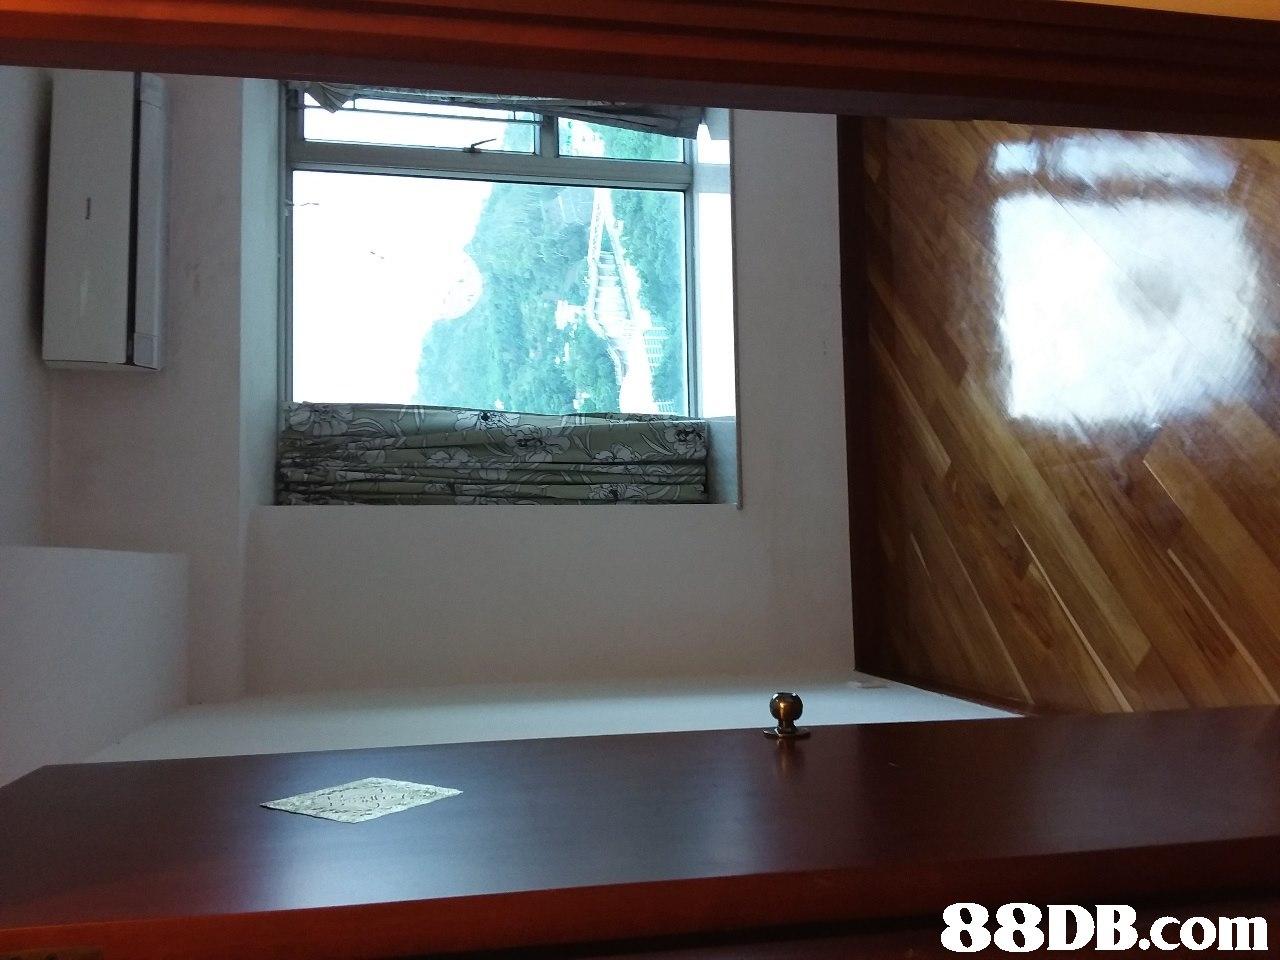 property,room,window,home,area